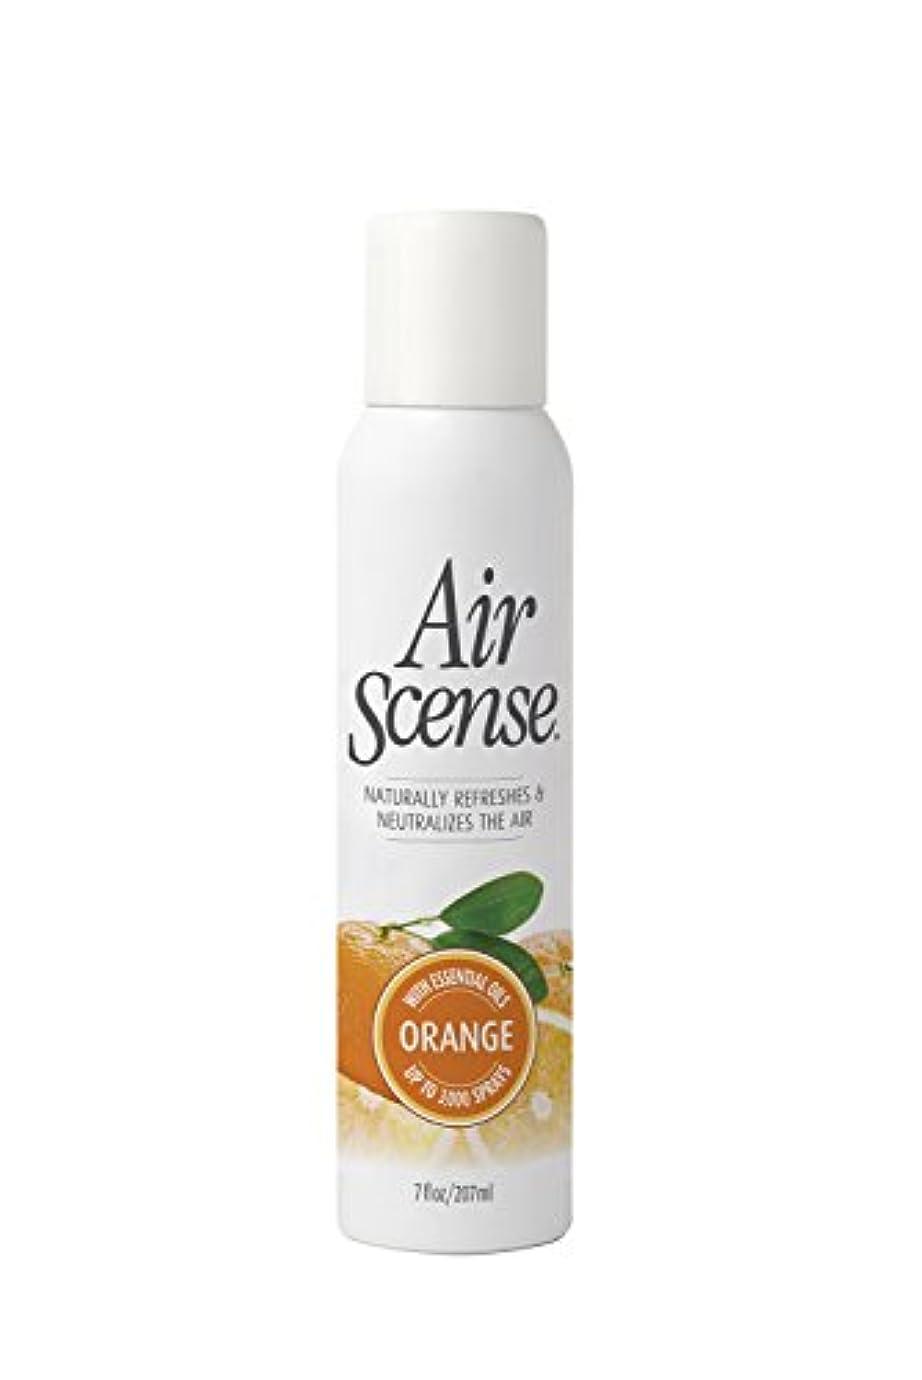 Air Scense - オレンジ芳香剤、4 X 7のFz